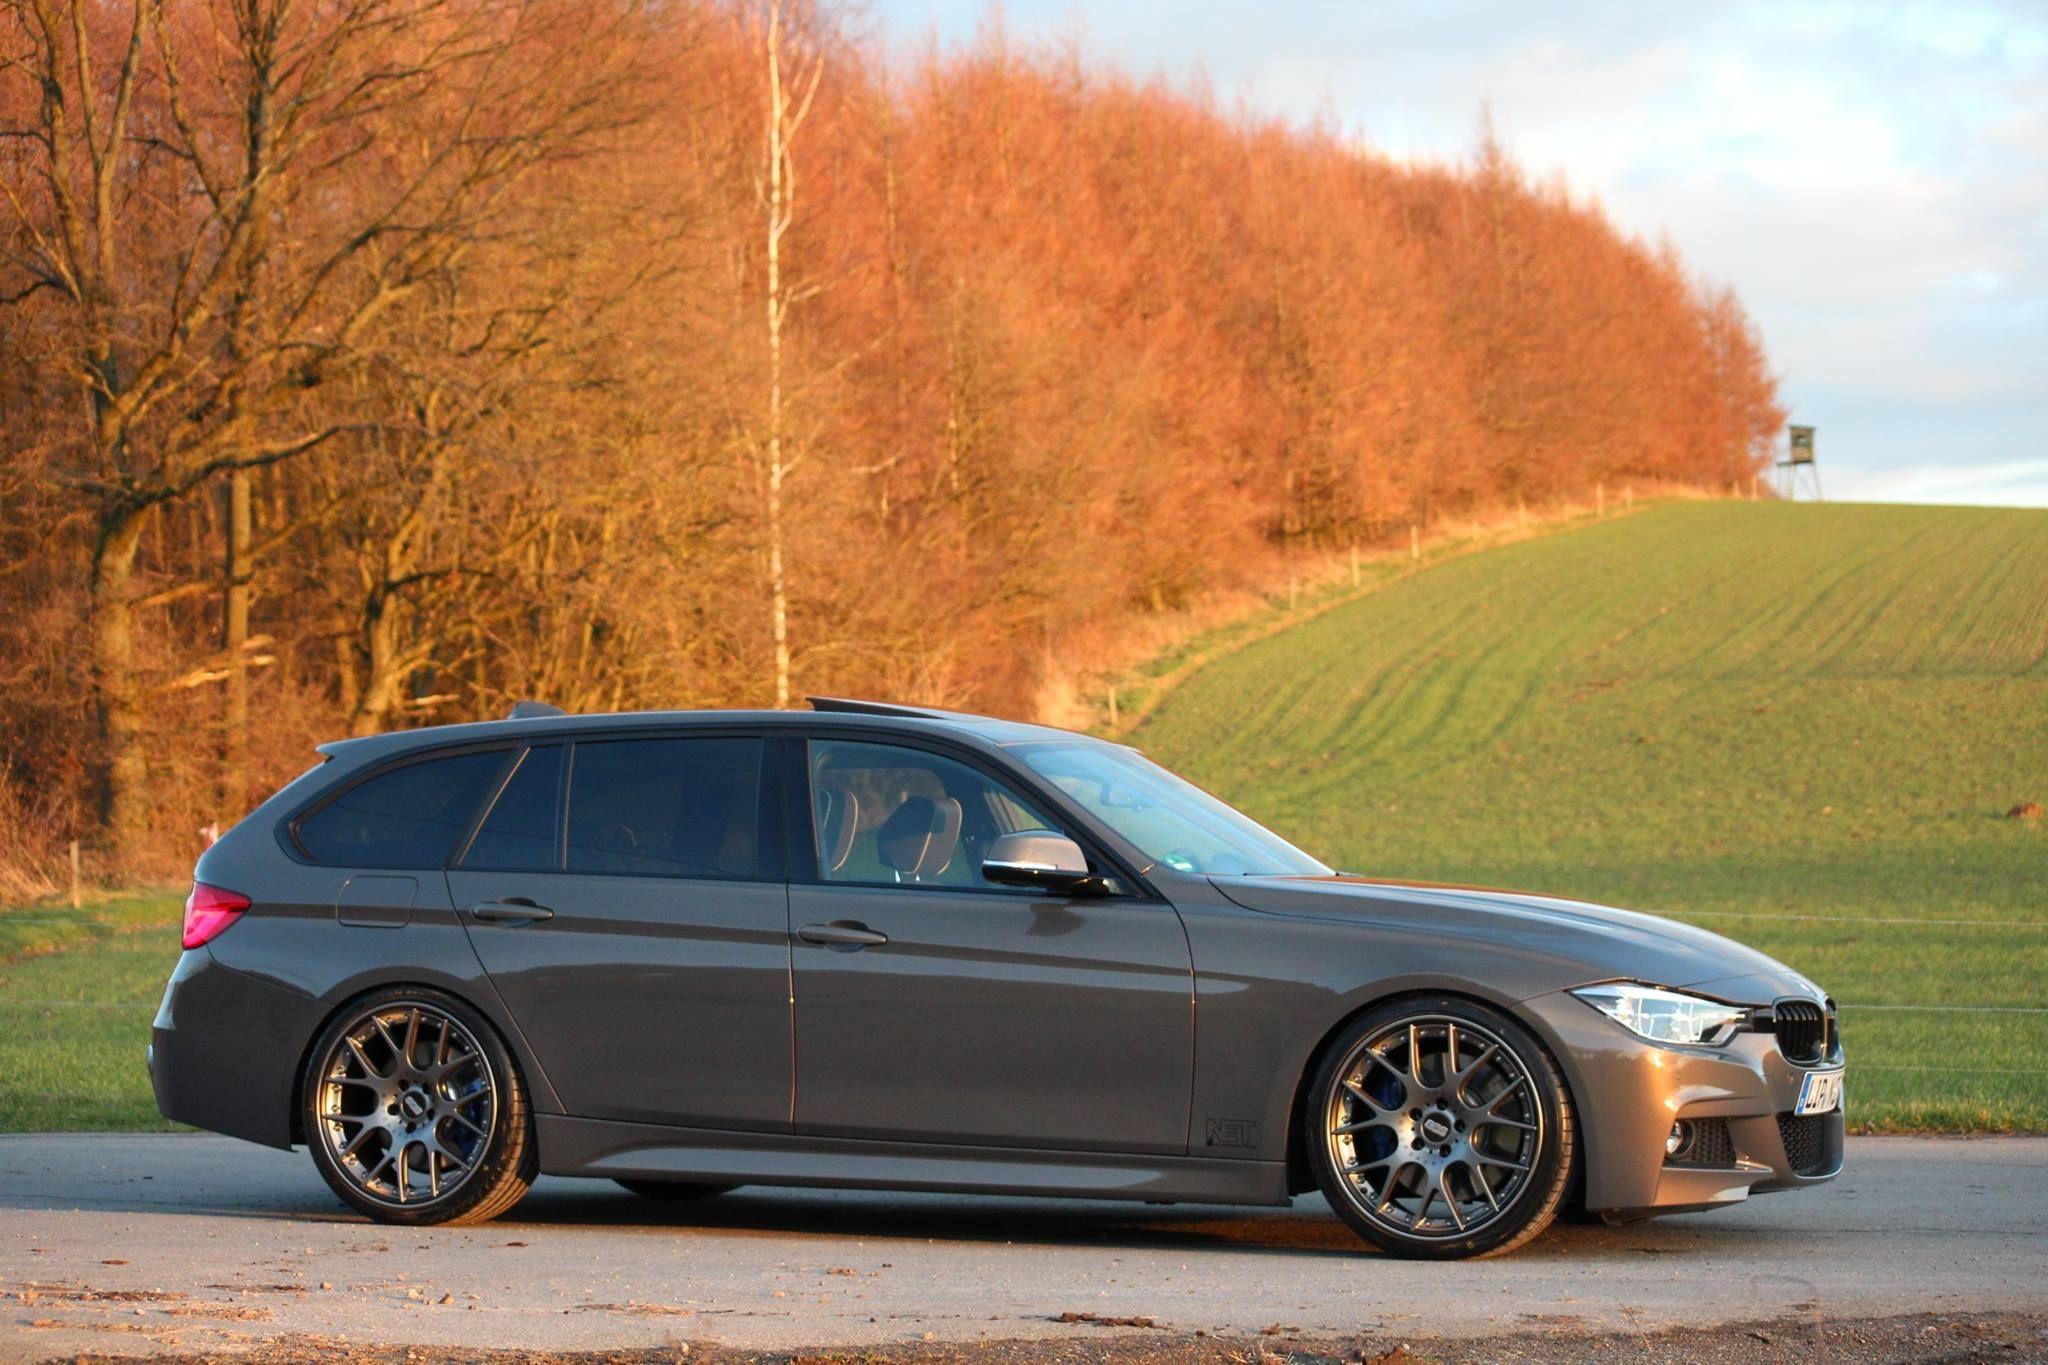 BMW F31 335i Touring xDrive MPackage  BMW beemer  Pinterest